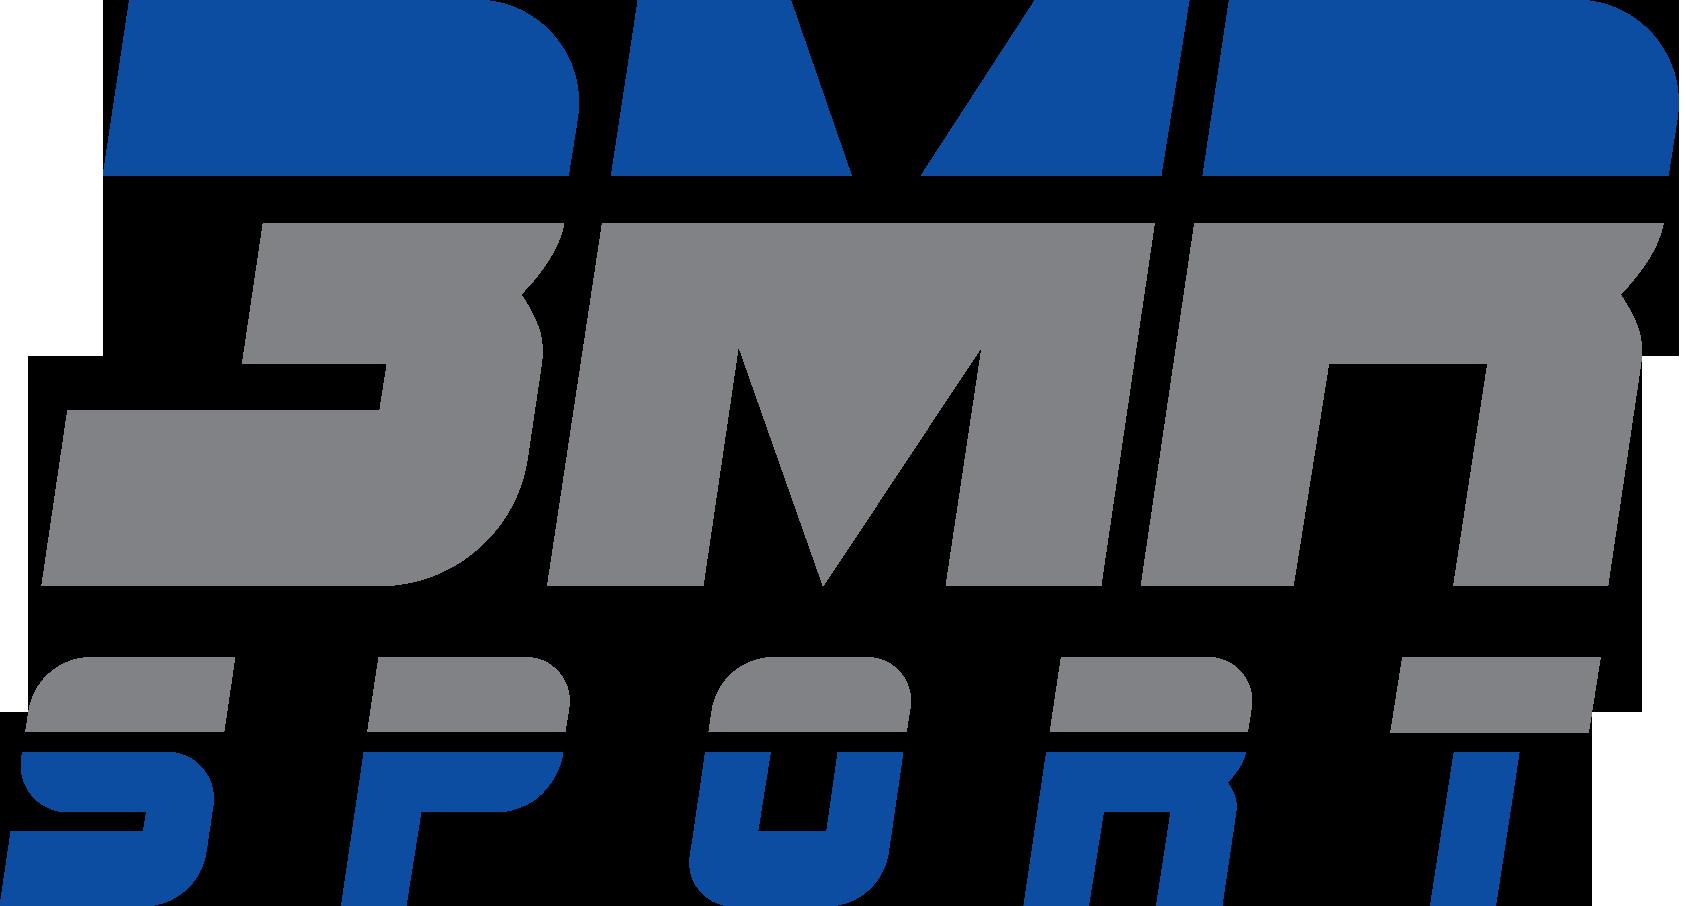 3MRsport